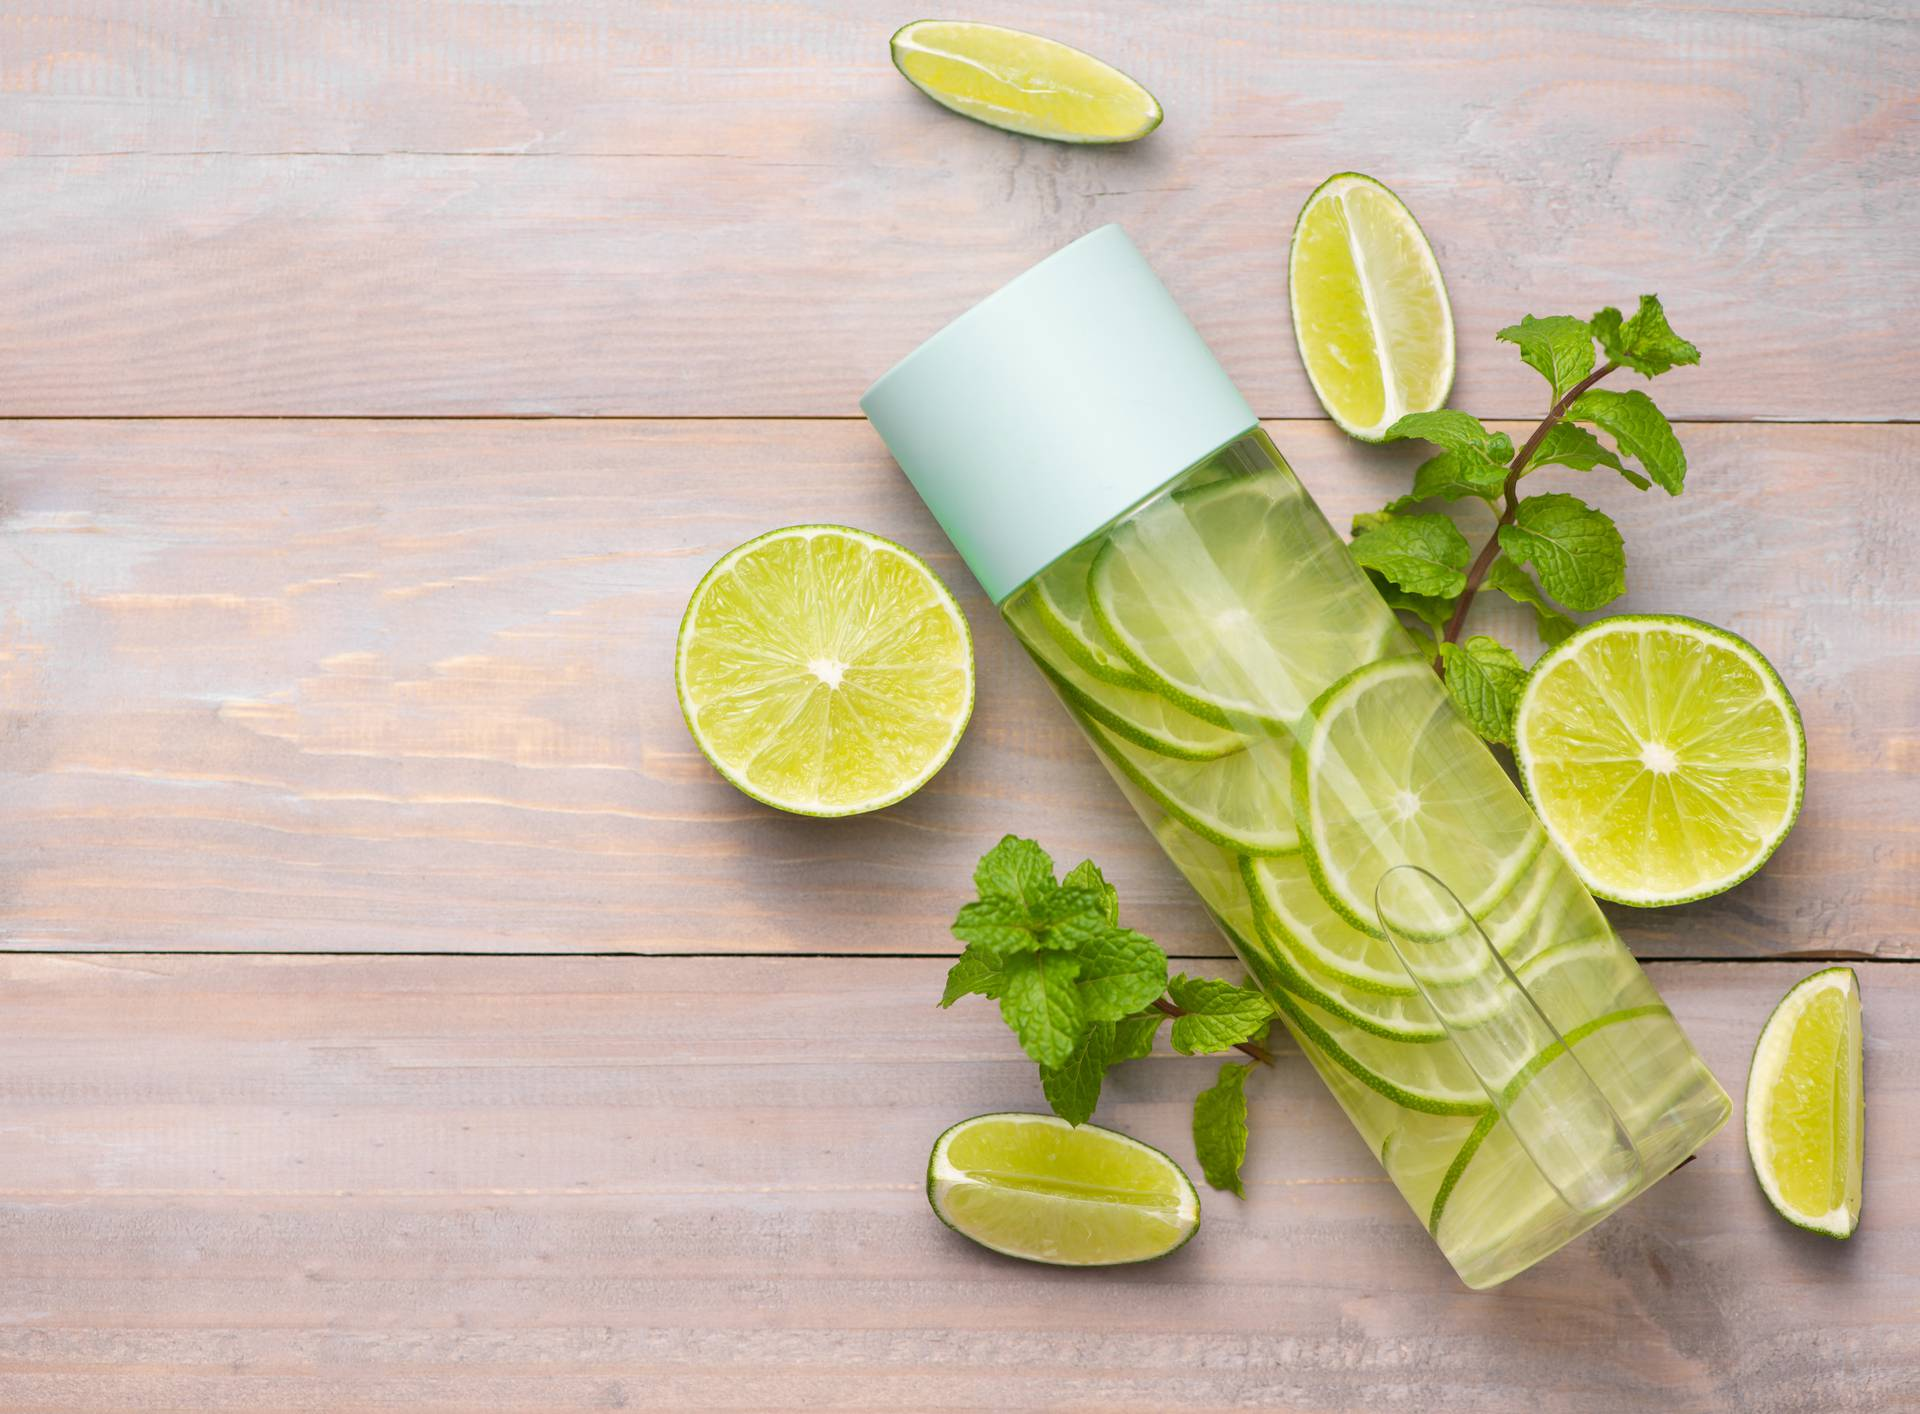 Čudesna Sassy voda: Limun i đumbir otapaju salo oko trbuha